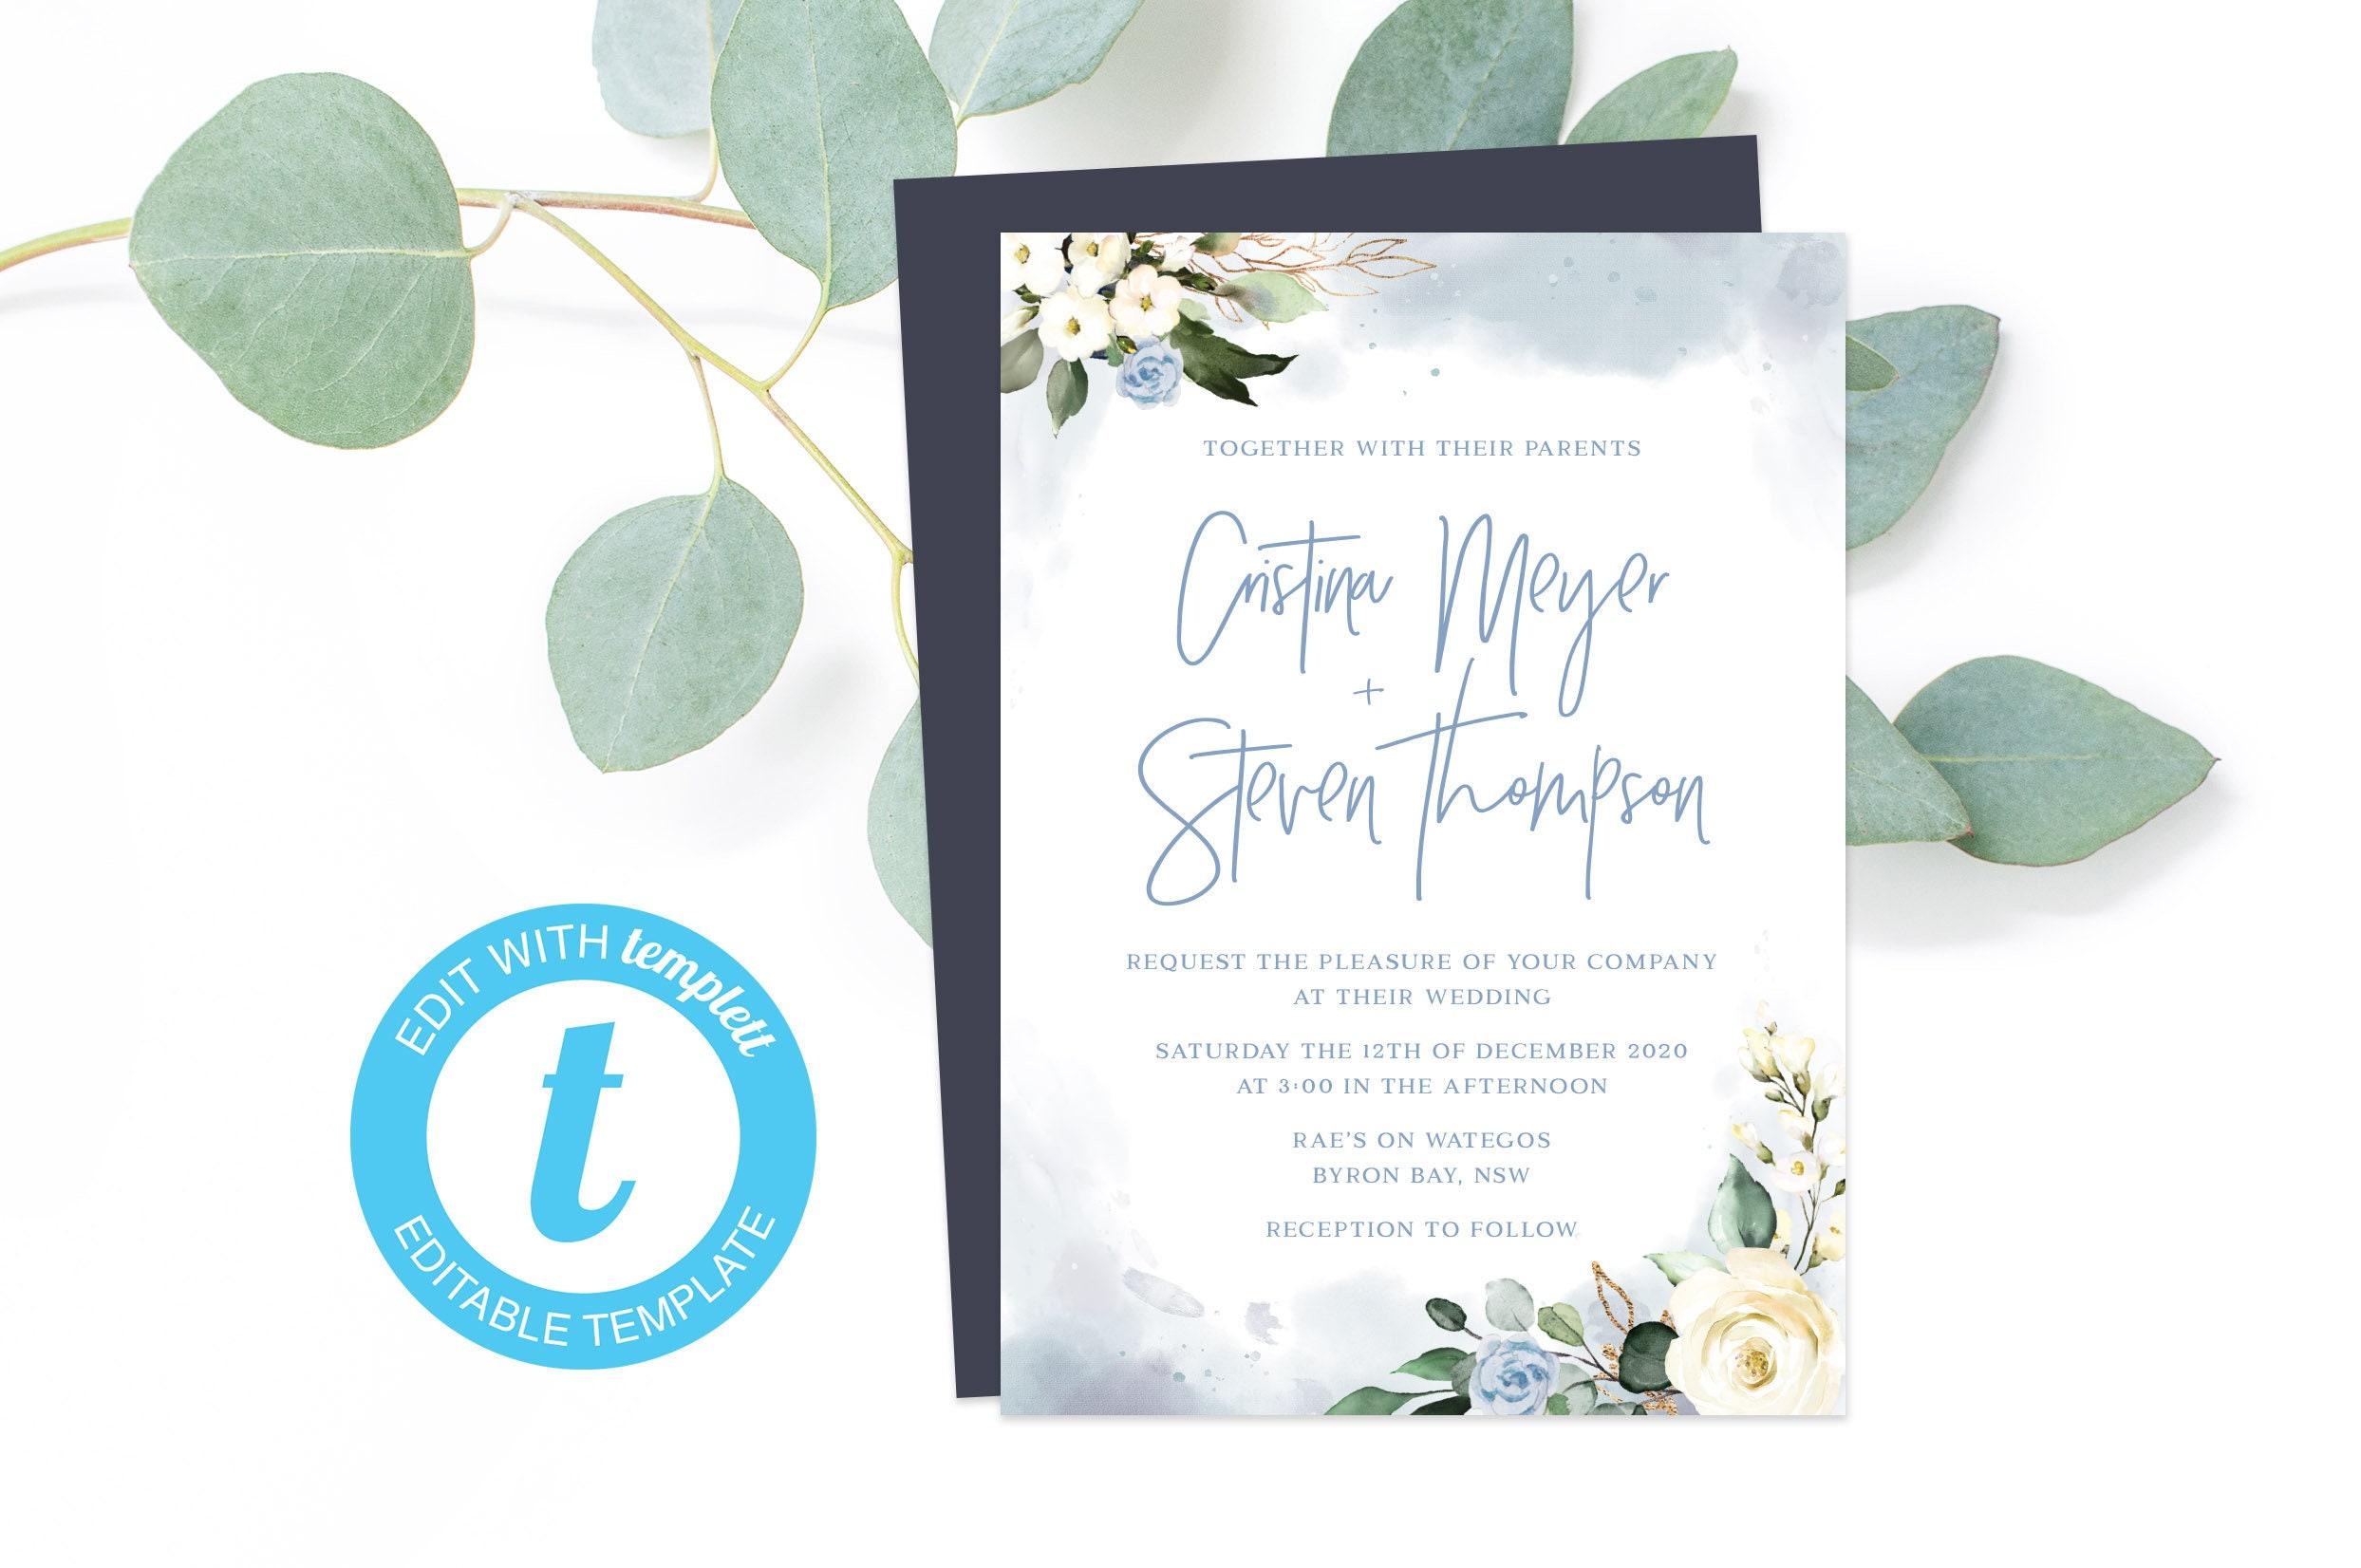 Dusty Blue Wedding Invitation Template, Watercolour Editable Invites, Cheap  Printable PDF, Rustic Engagement Party Invites, DIY Online PDF